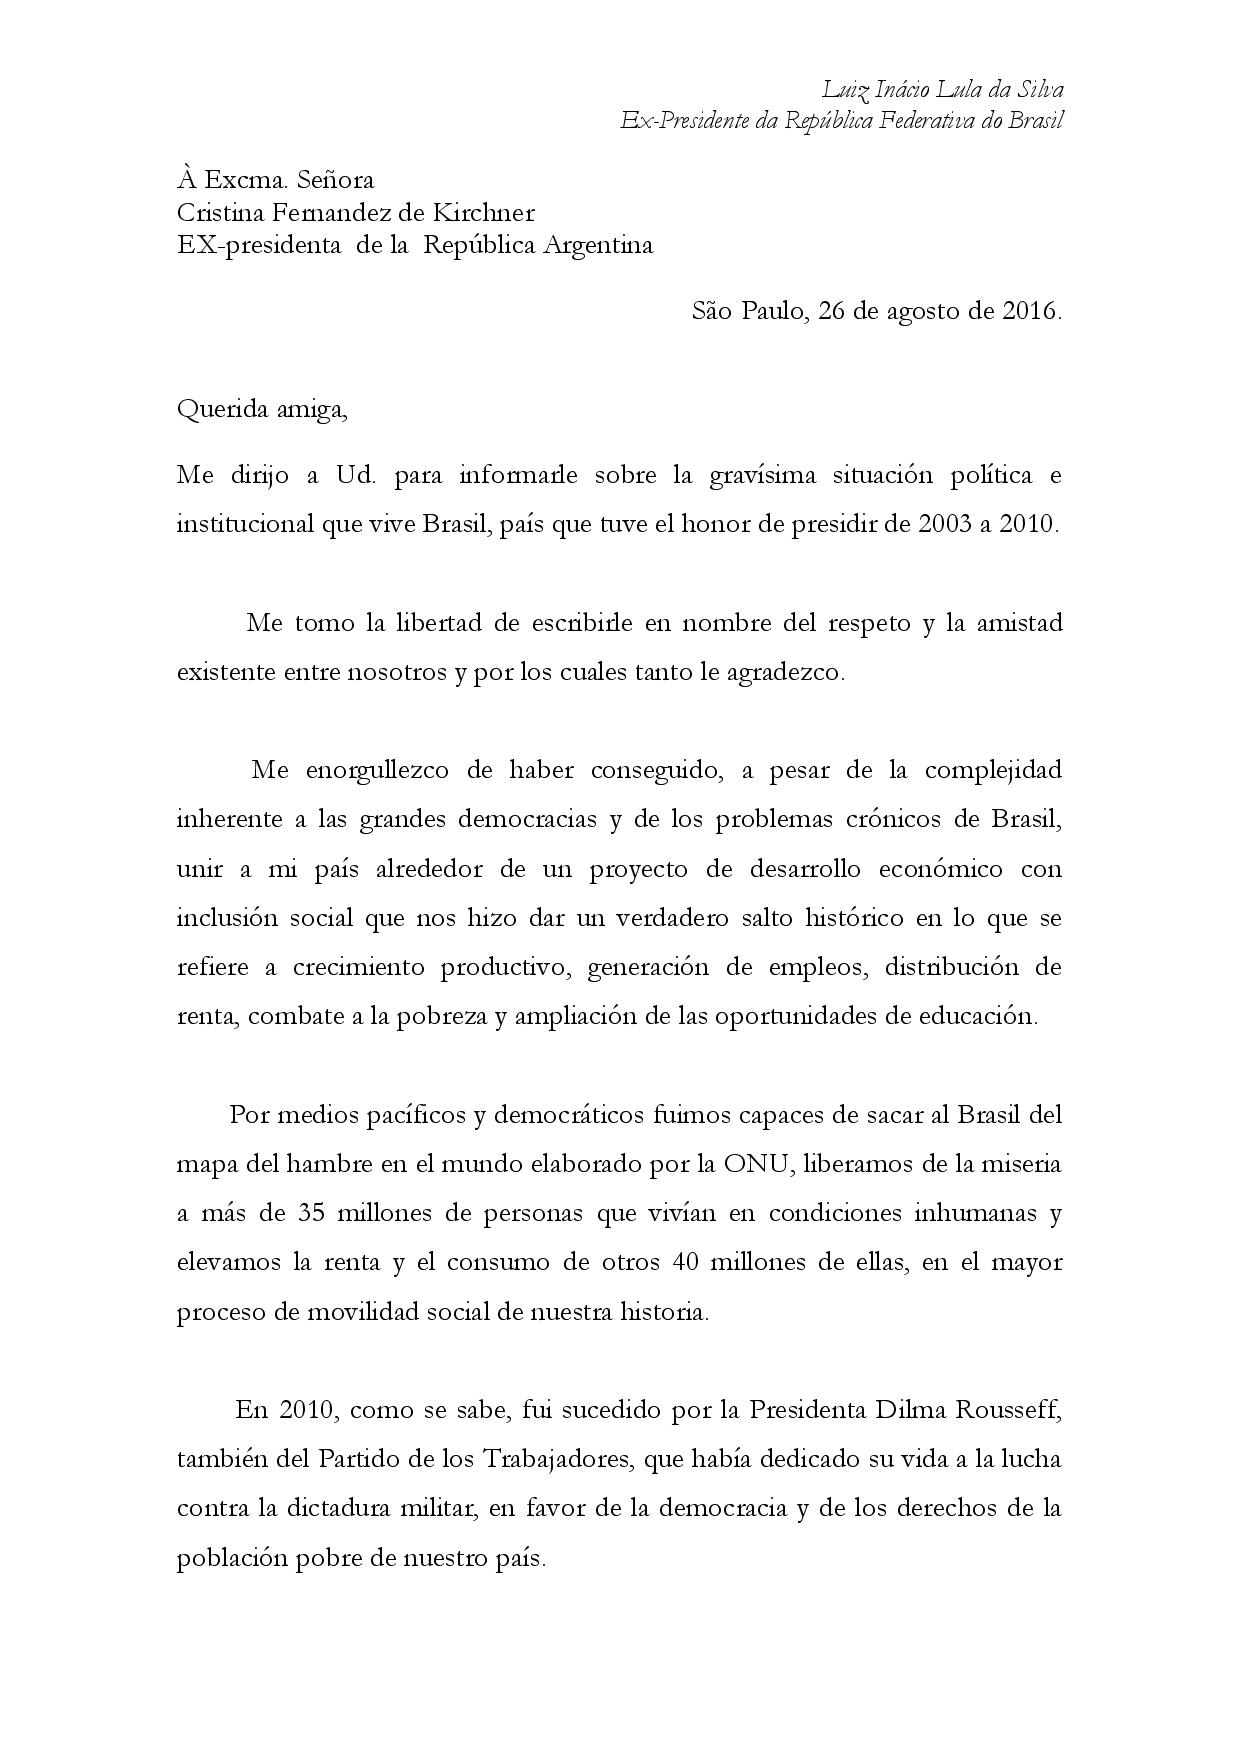 Argentina Ex-presidenta-page-001